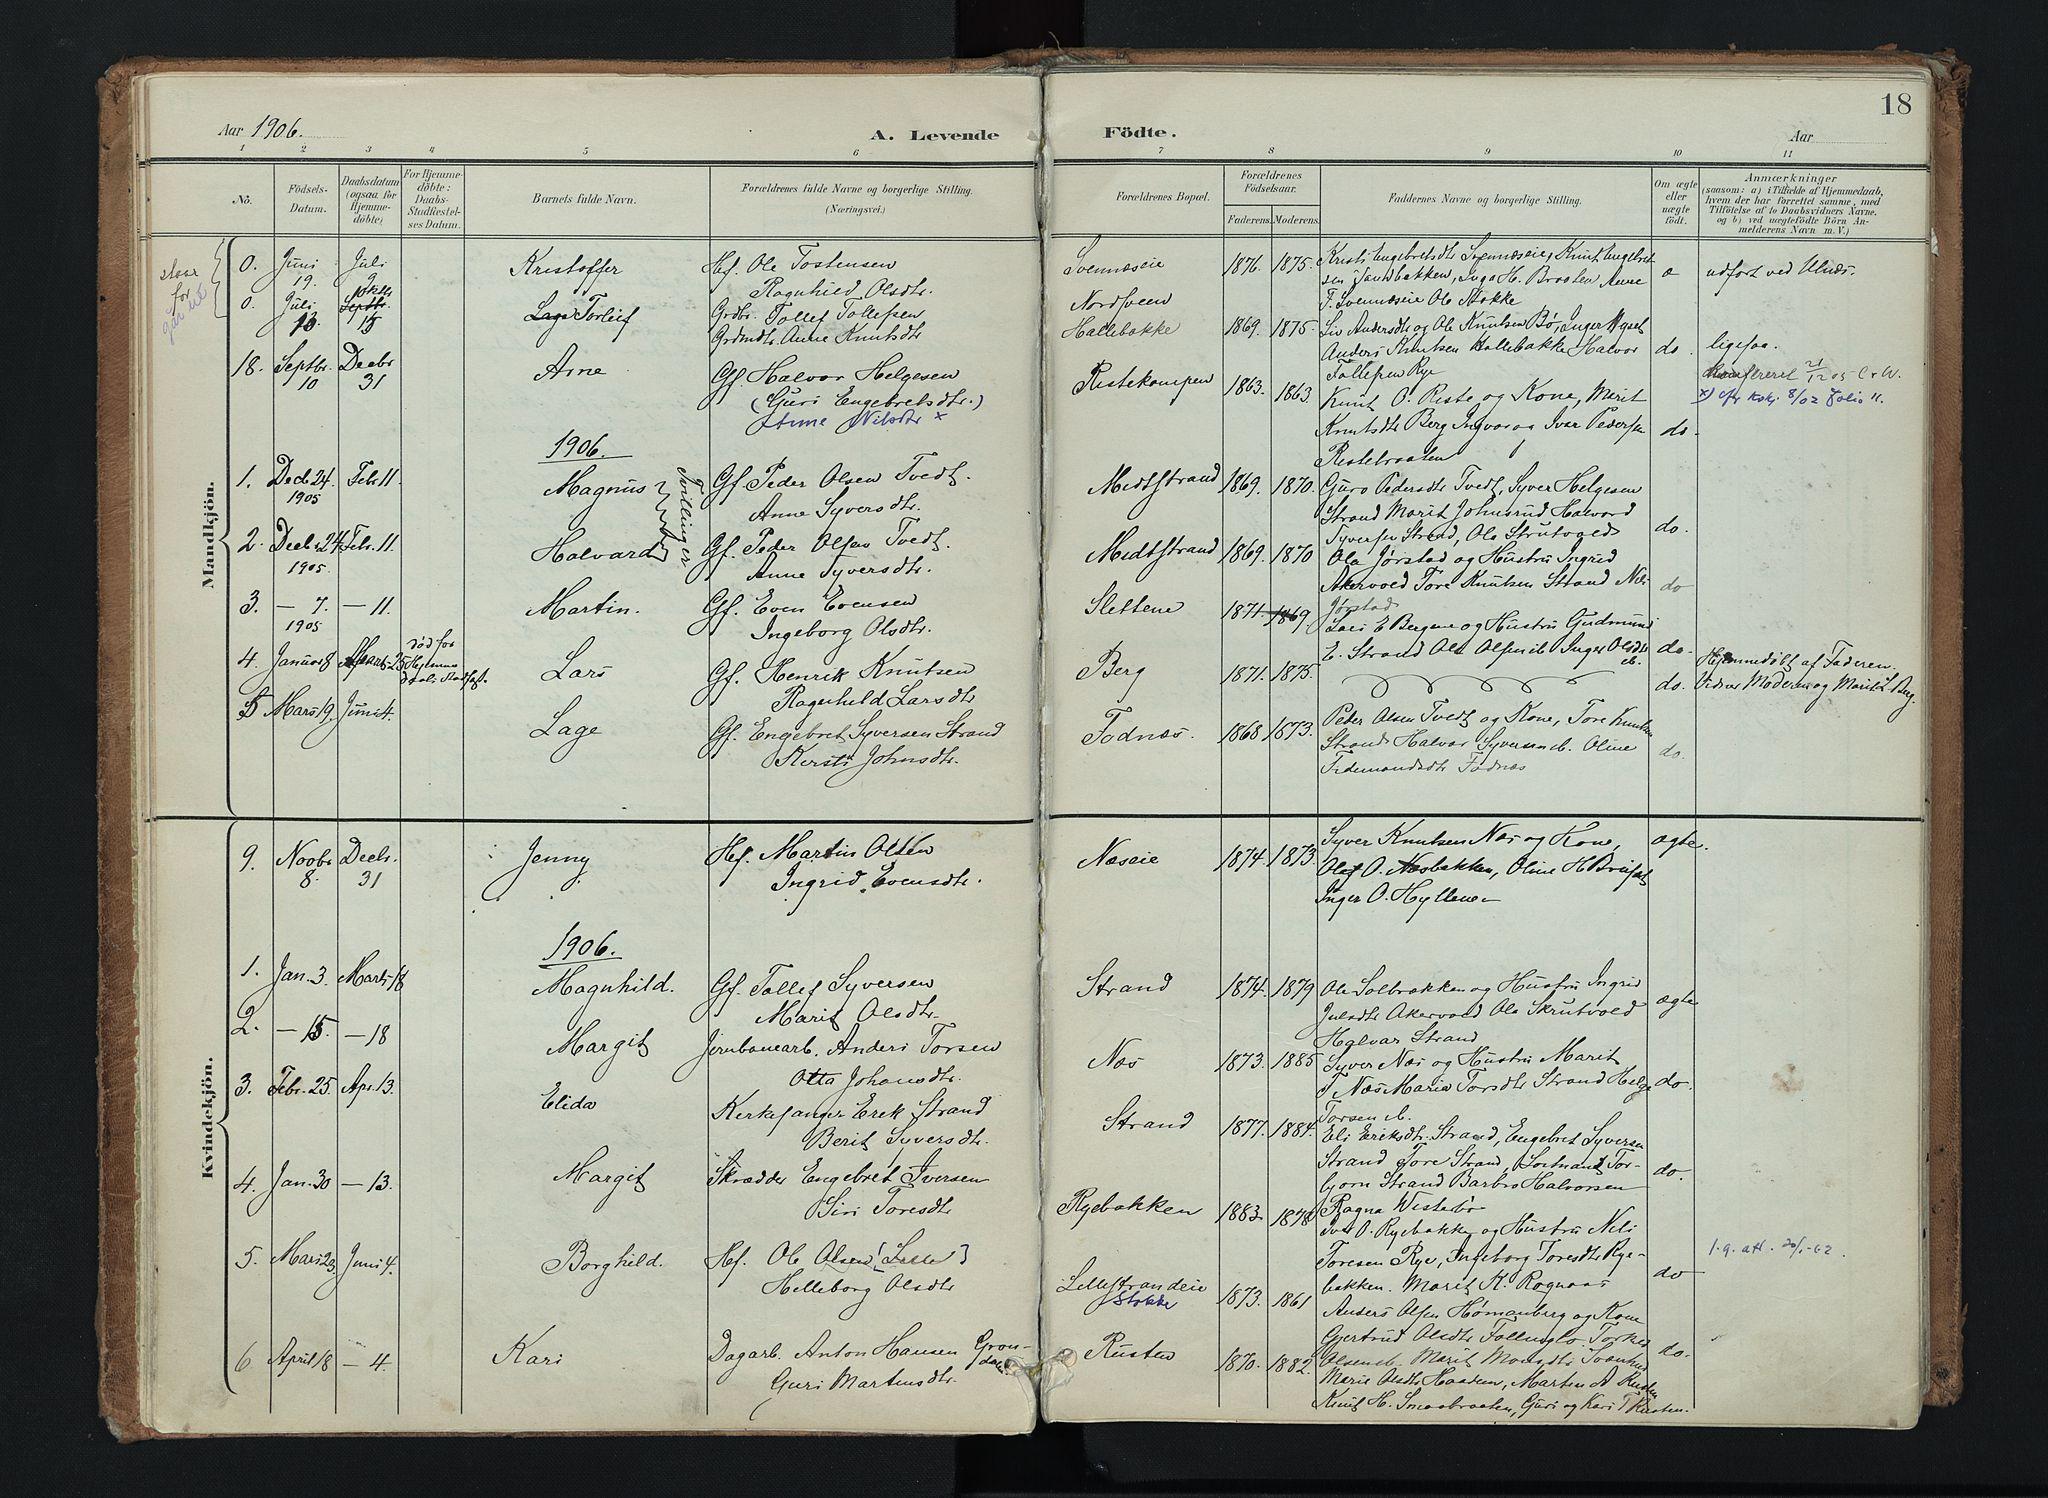 SAH, Nord-Aurdal prestekontor, Ministerialbok nr. 16, 1897-1925, s. 18